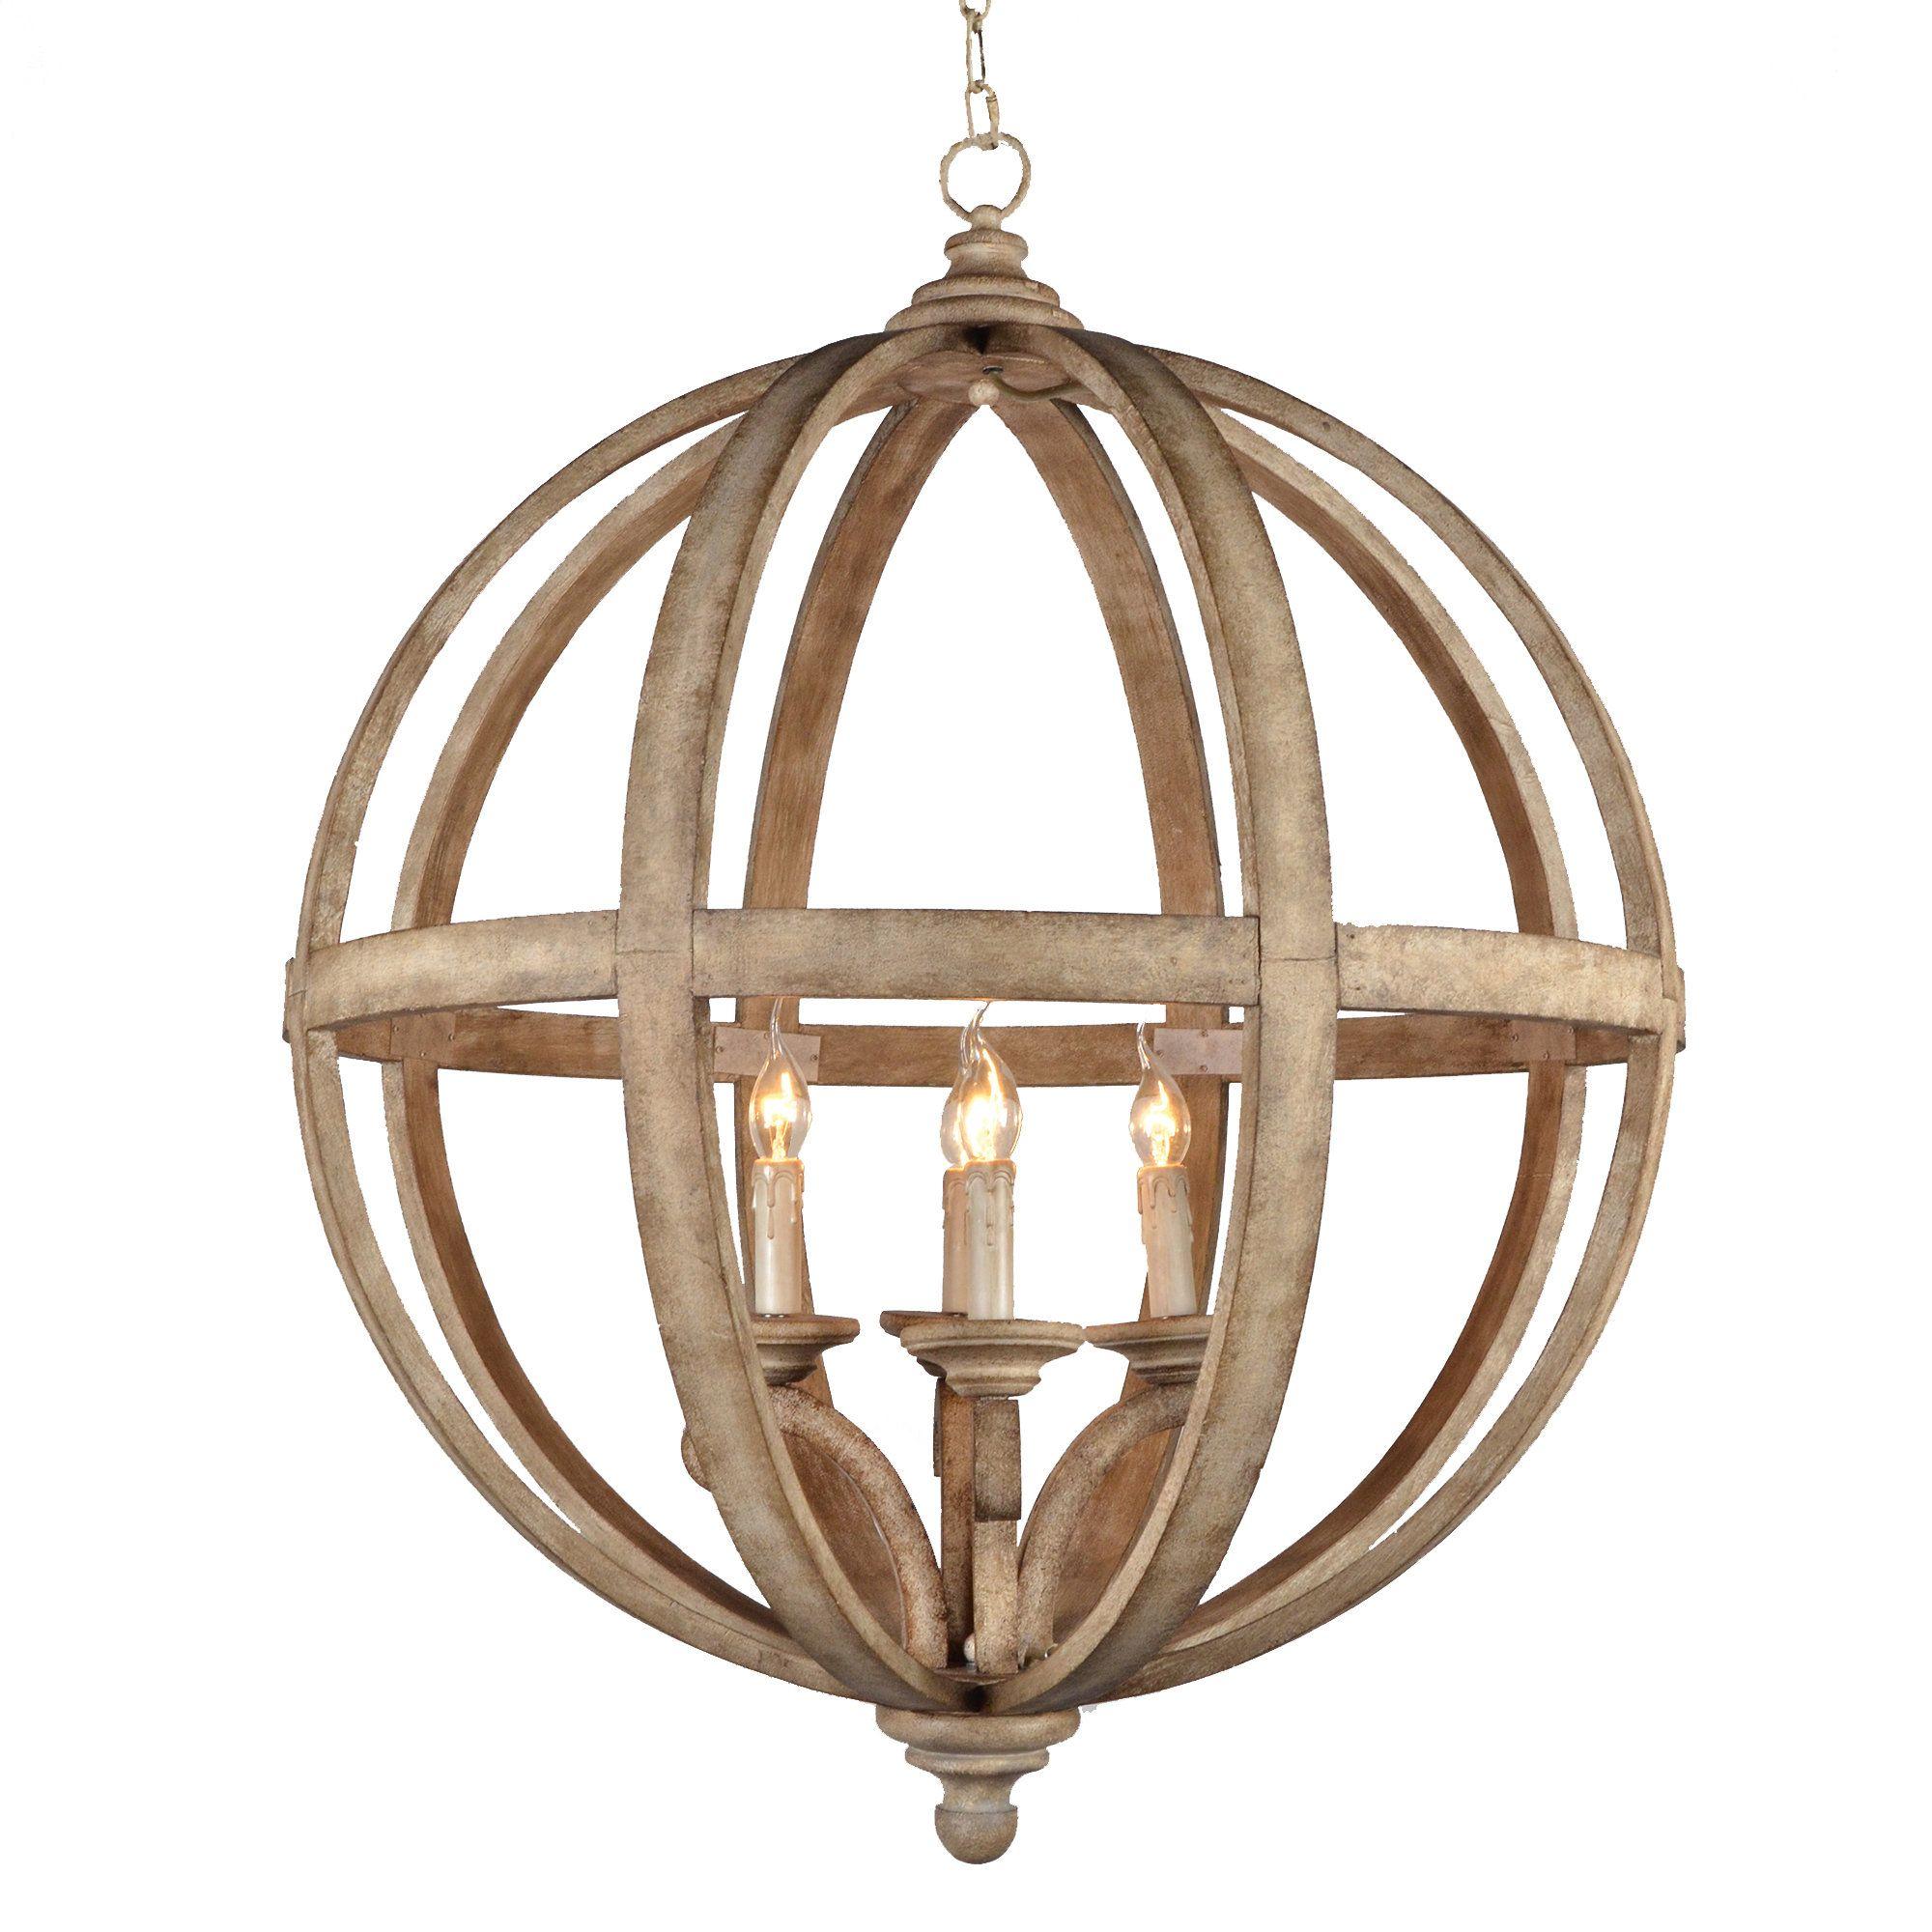 Y Decor Hercules 4 light Neutral Chandelier with Wooden Globe